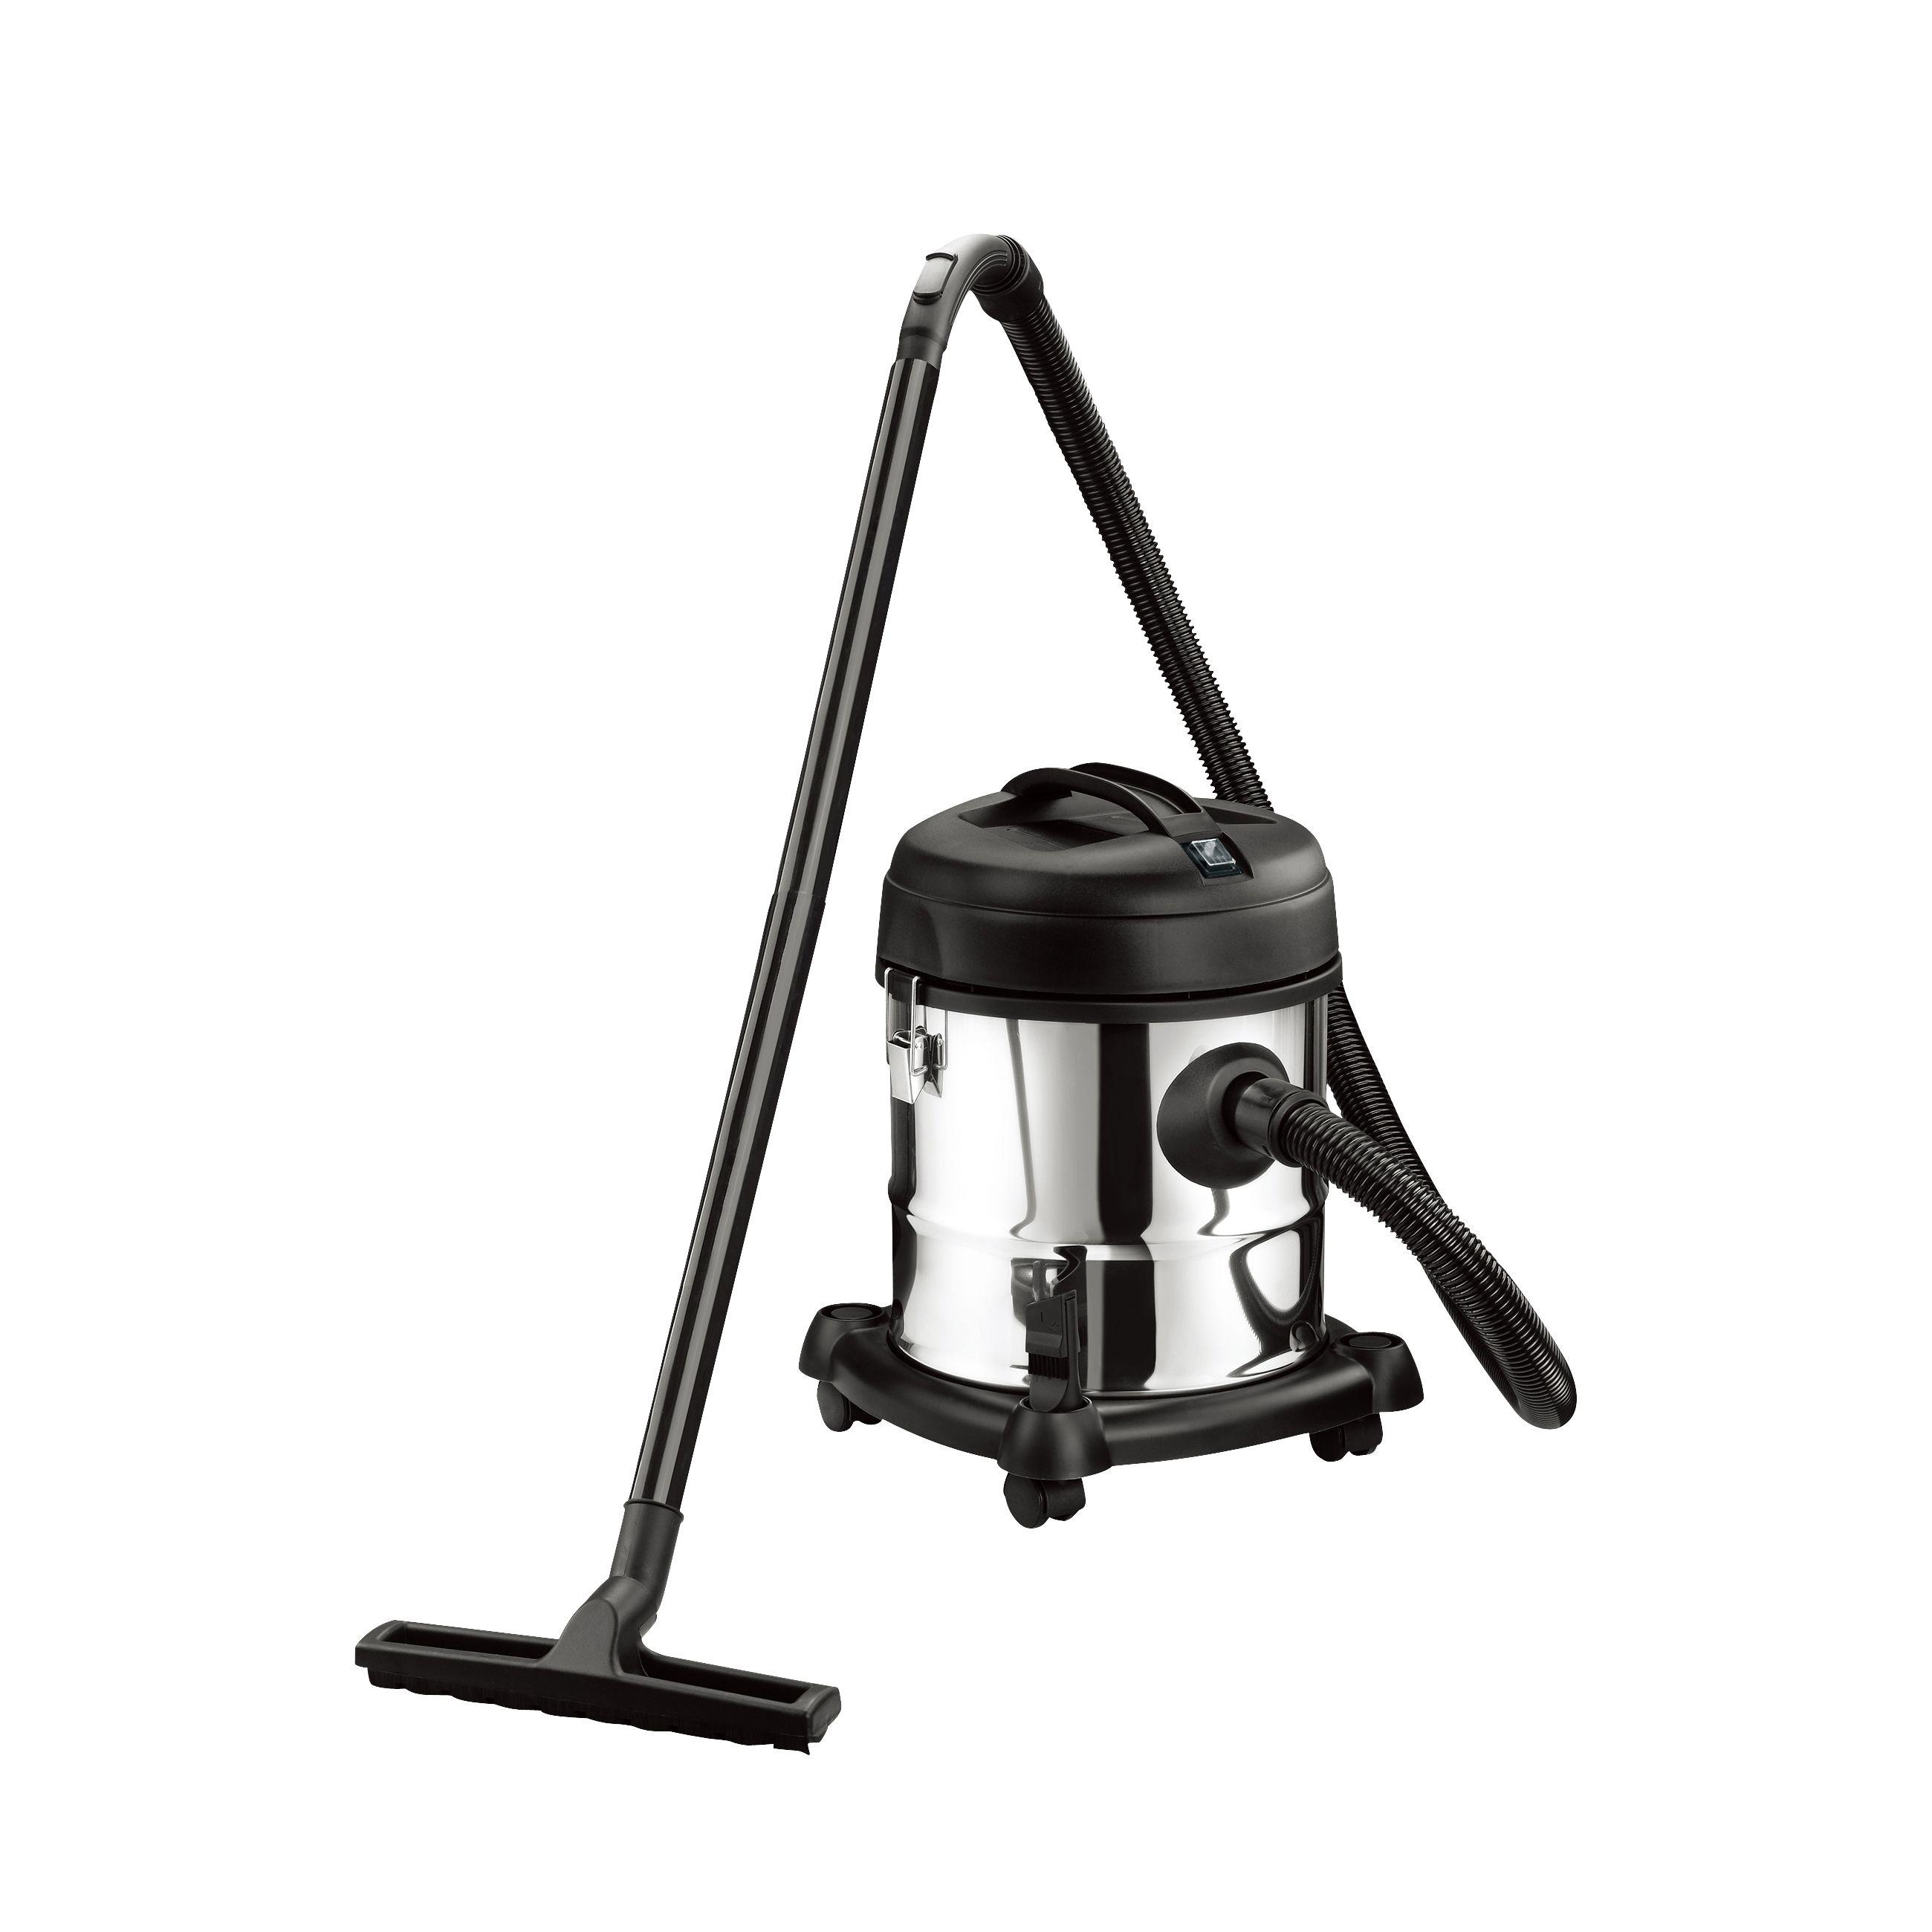 Performance Power LiFE wet & dry vacuum cleaner £30 + 2 year guarantee @ B&Q